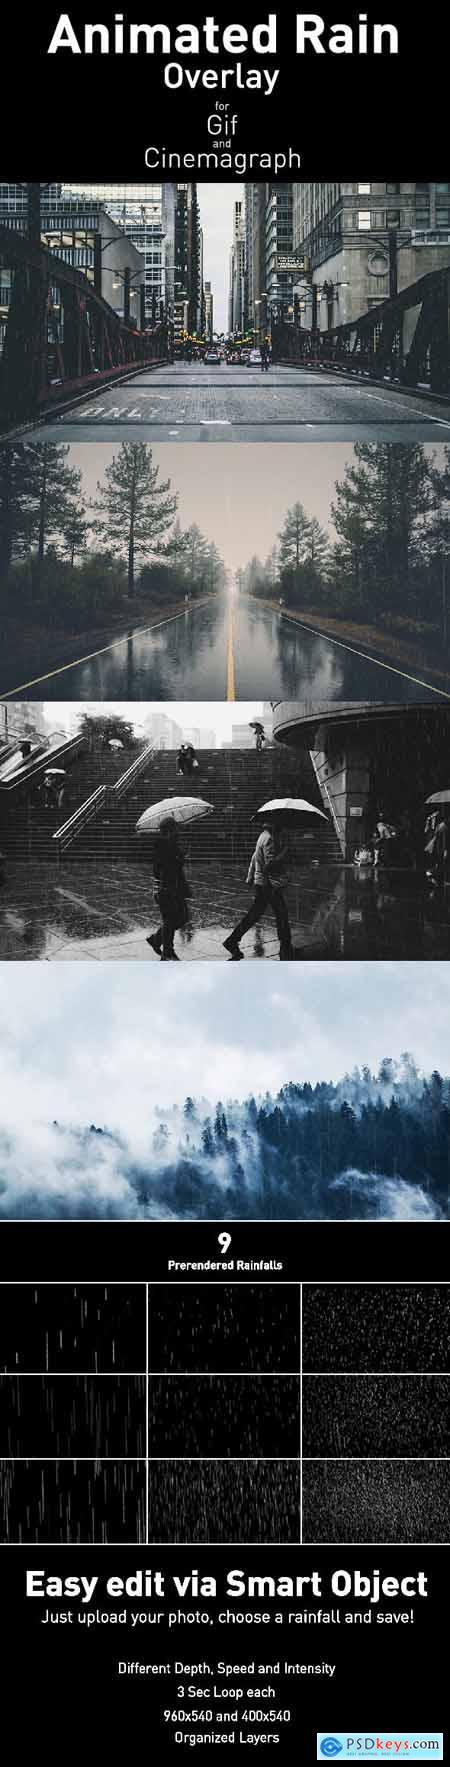 Animated Rain Overlay 18600498